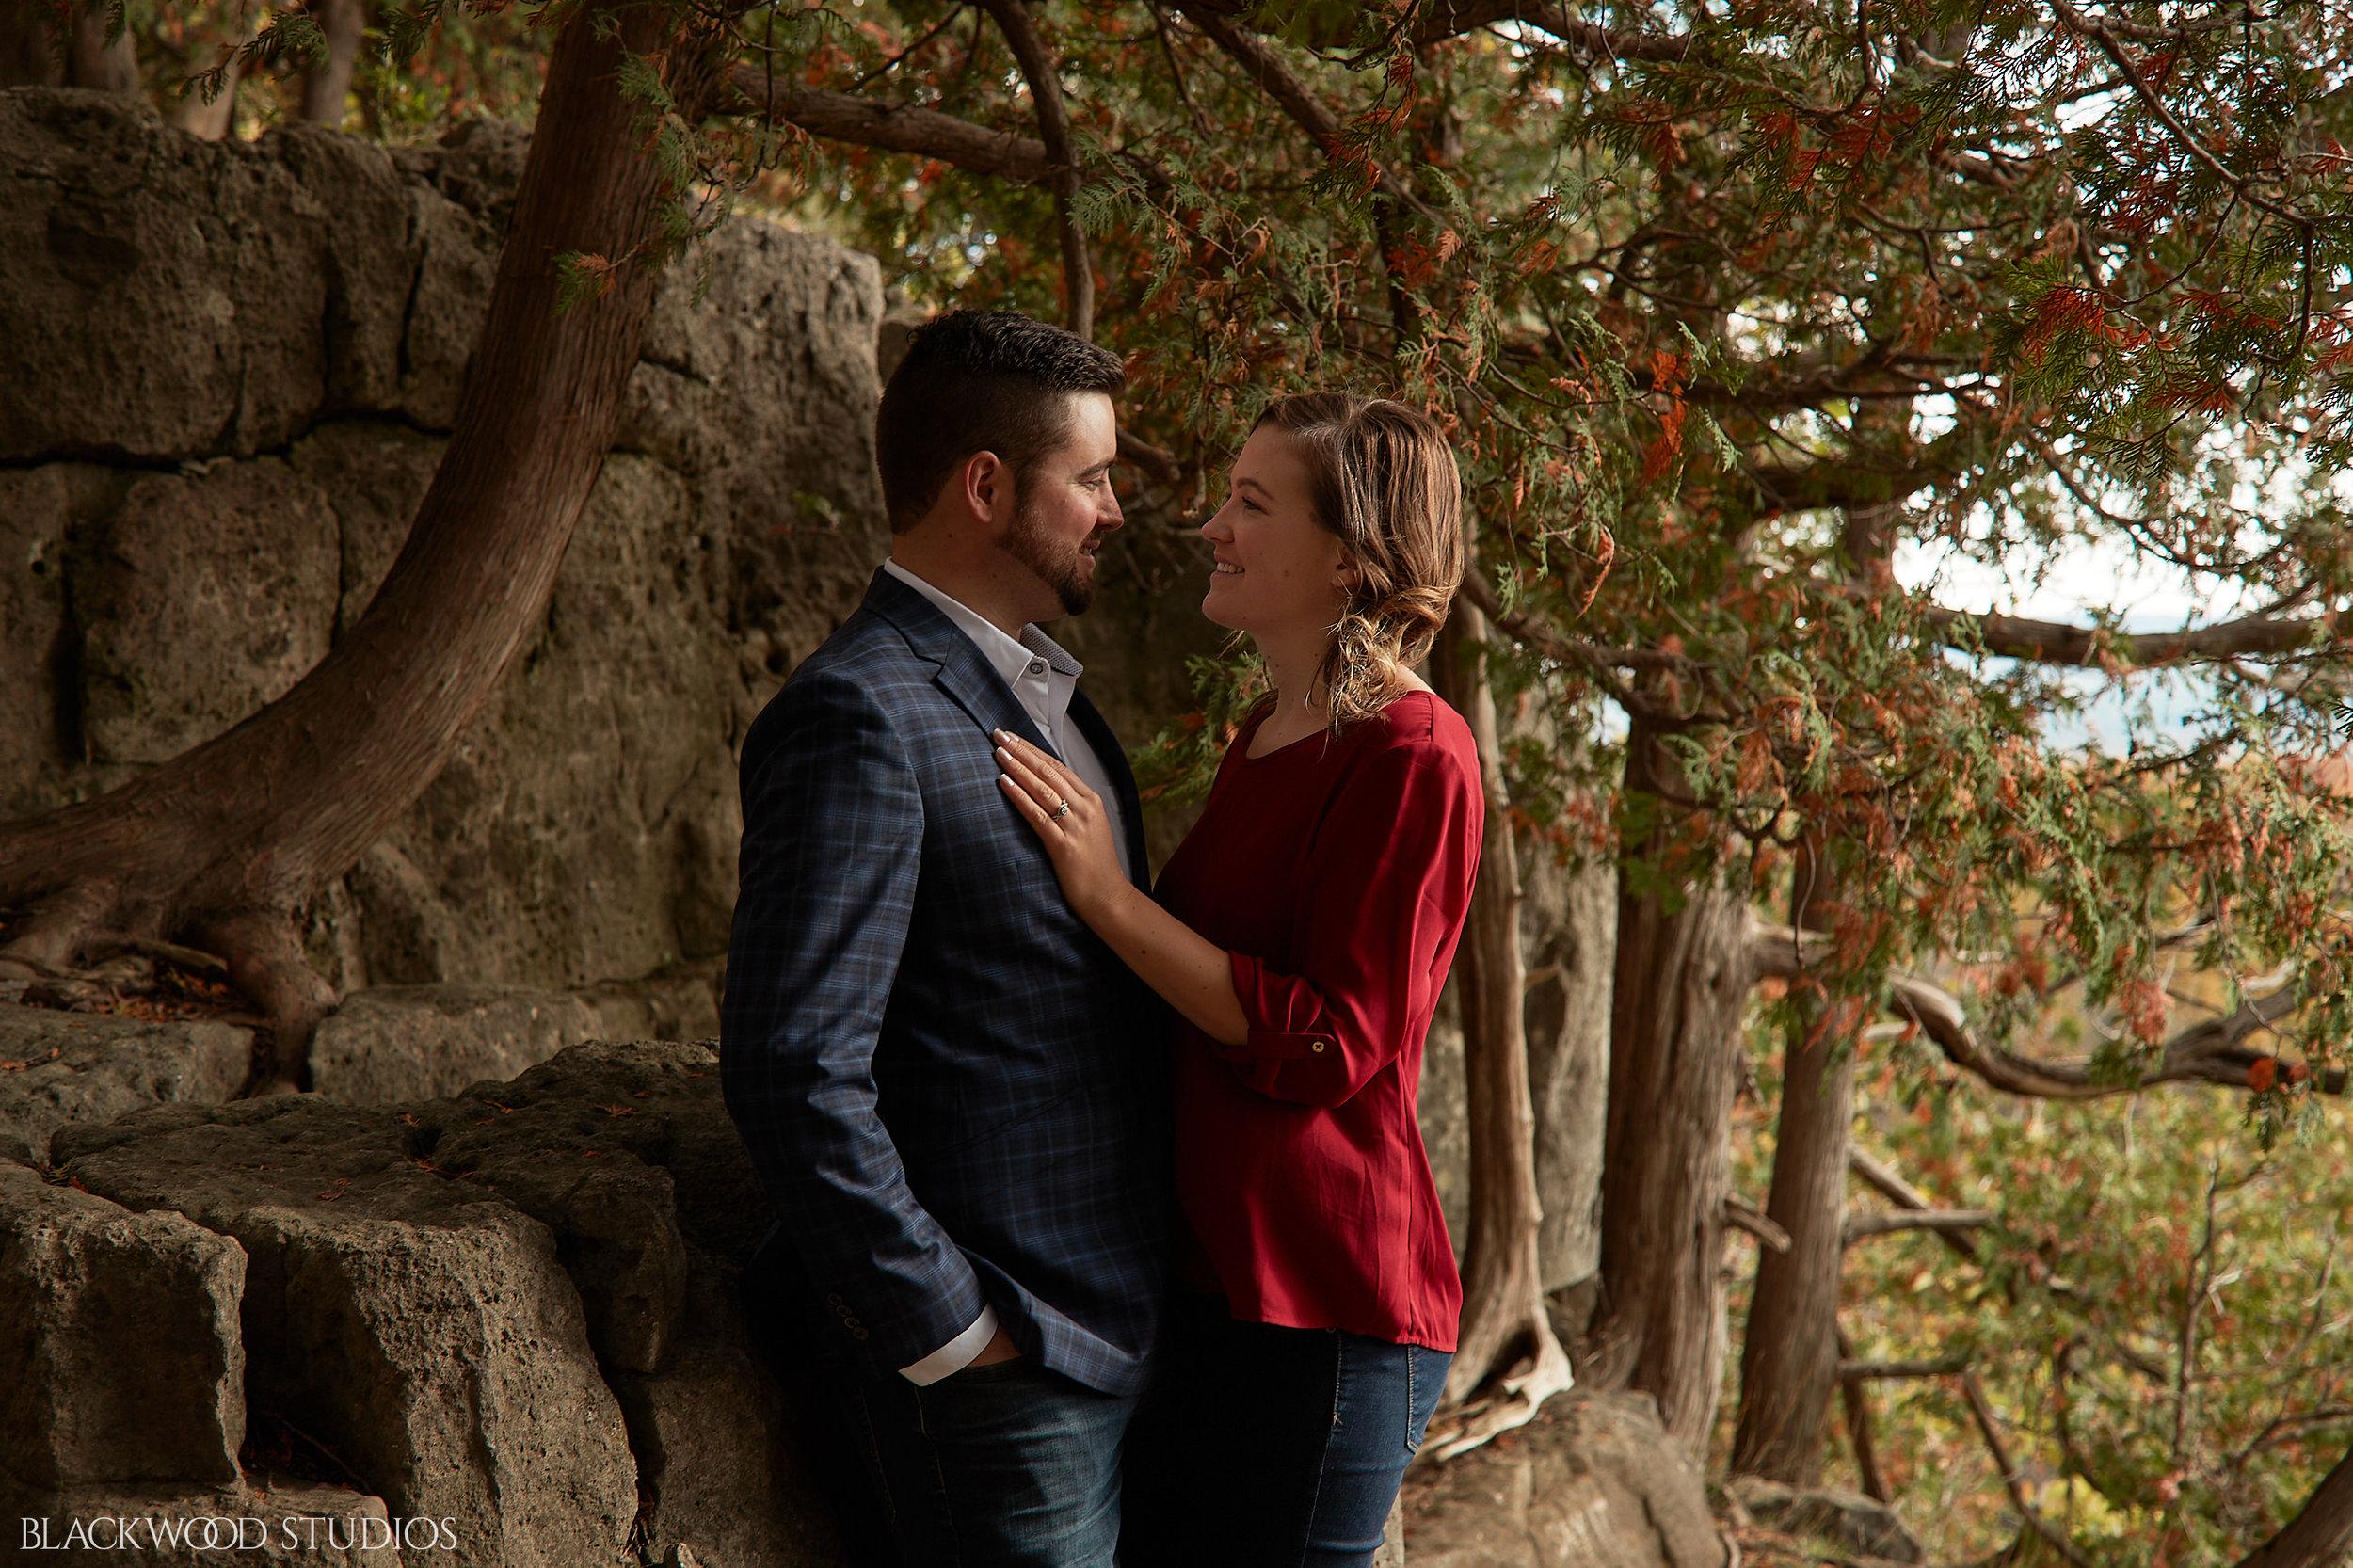 Blackwood-Studios-20181014-145752-Dave-and-Natalie-Engagement-0027-Rattlesnake-Point-Conservation-Area-Milton-Ontario.jpg